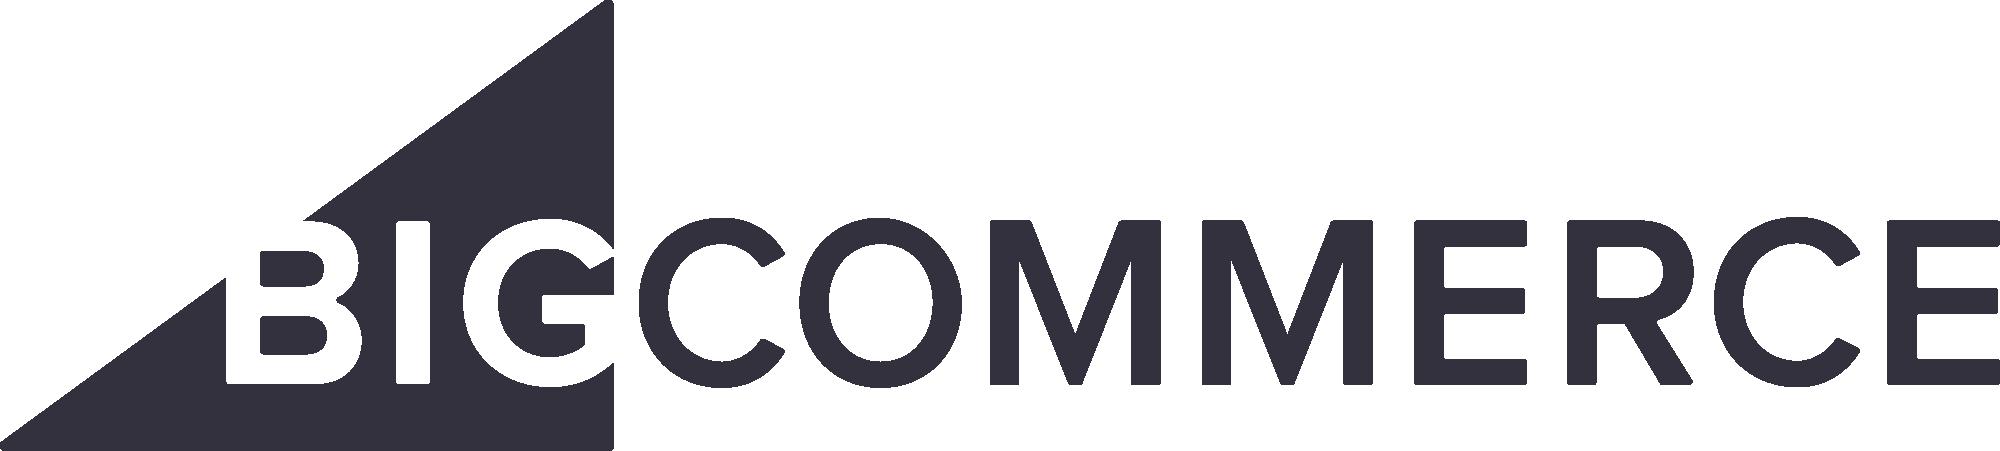 Bigcommerce E-commerce Software Solution